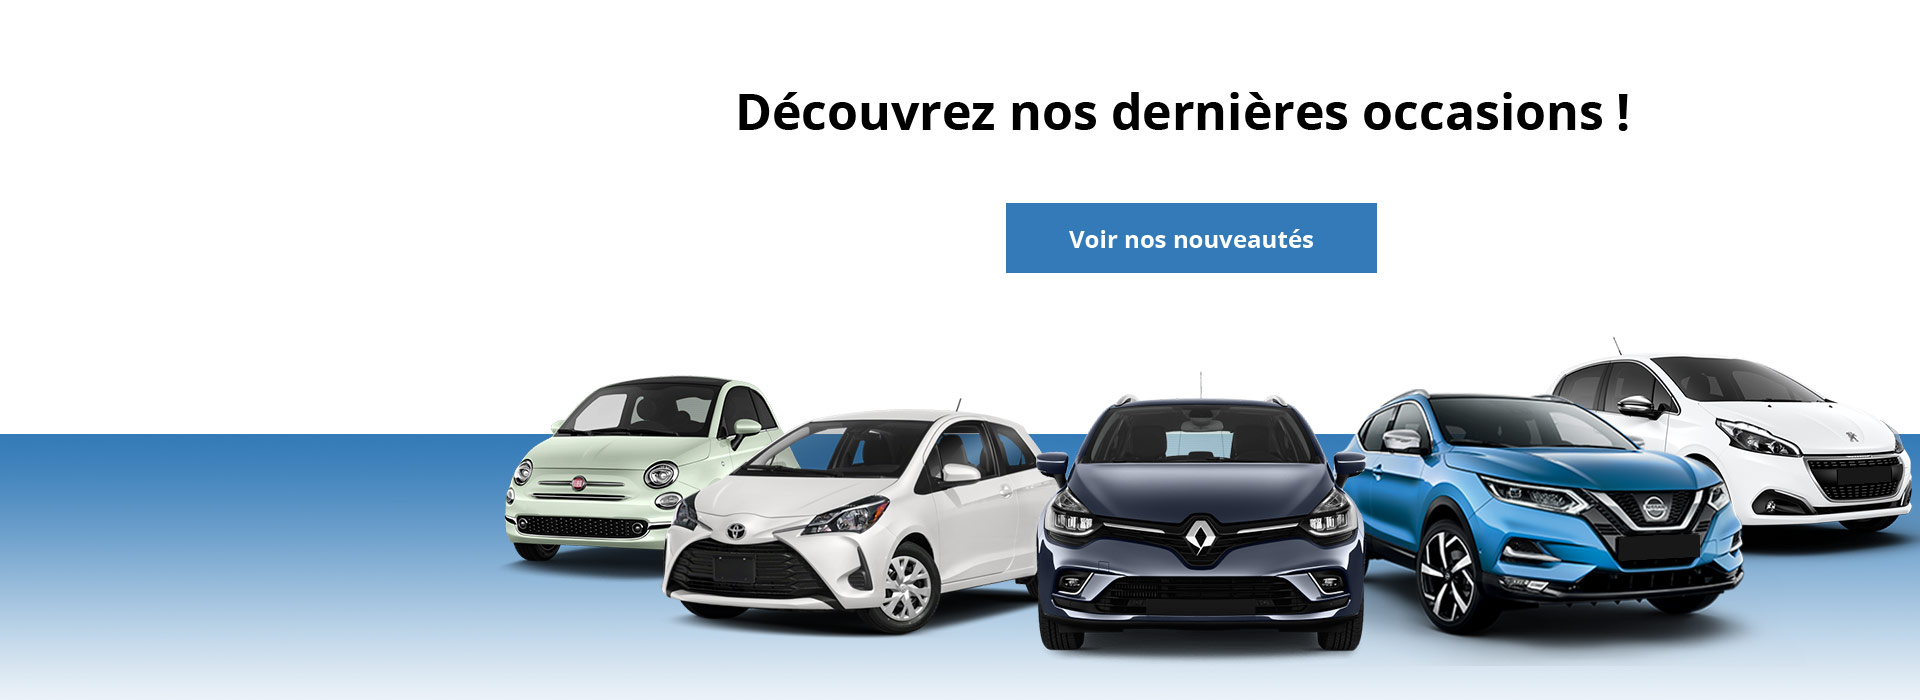 Automobile Occasion Achat Vente Automobiles Doccasion >> Automobile Occasion Achat Vente Automobiles D Occasion Garanties